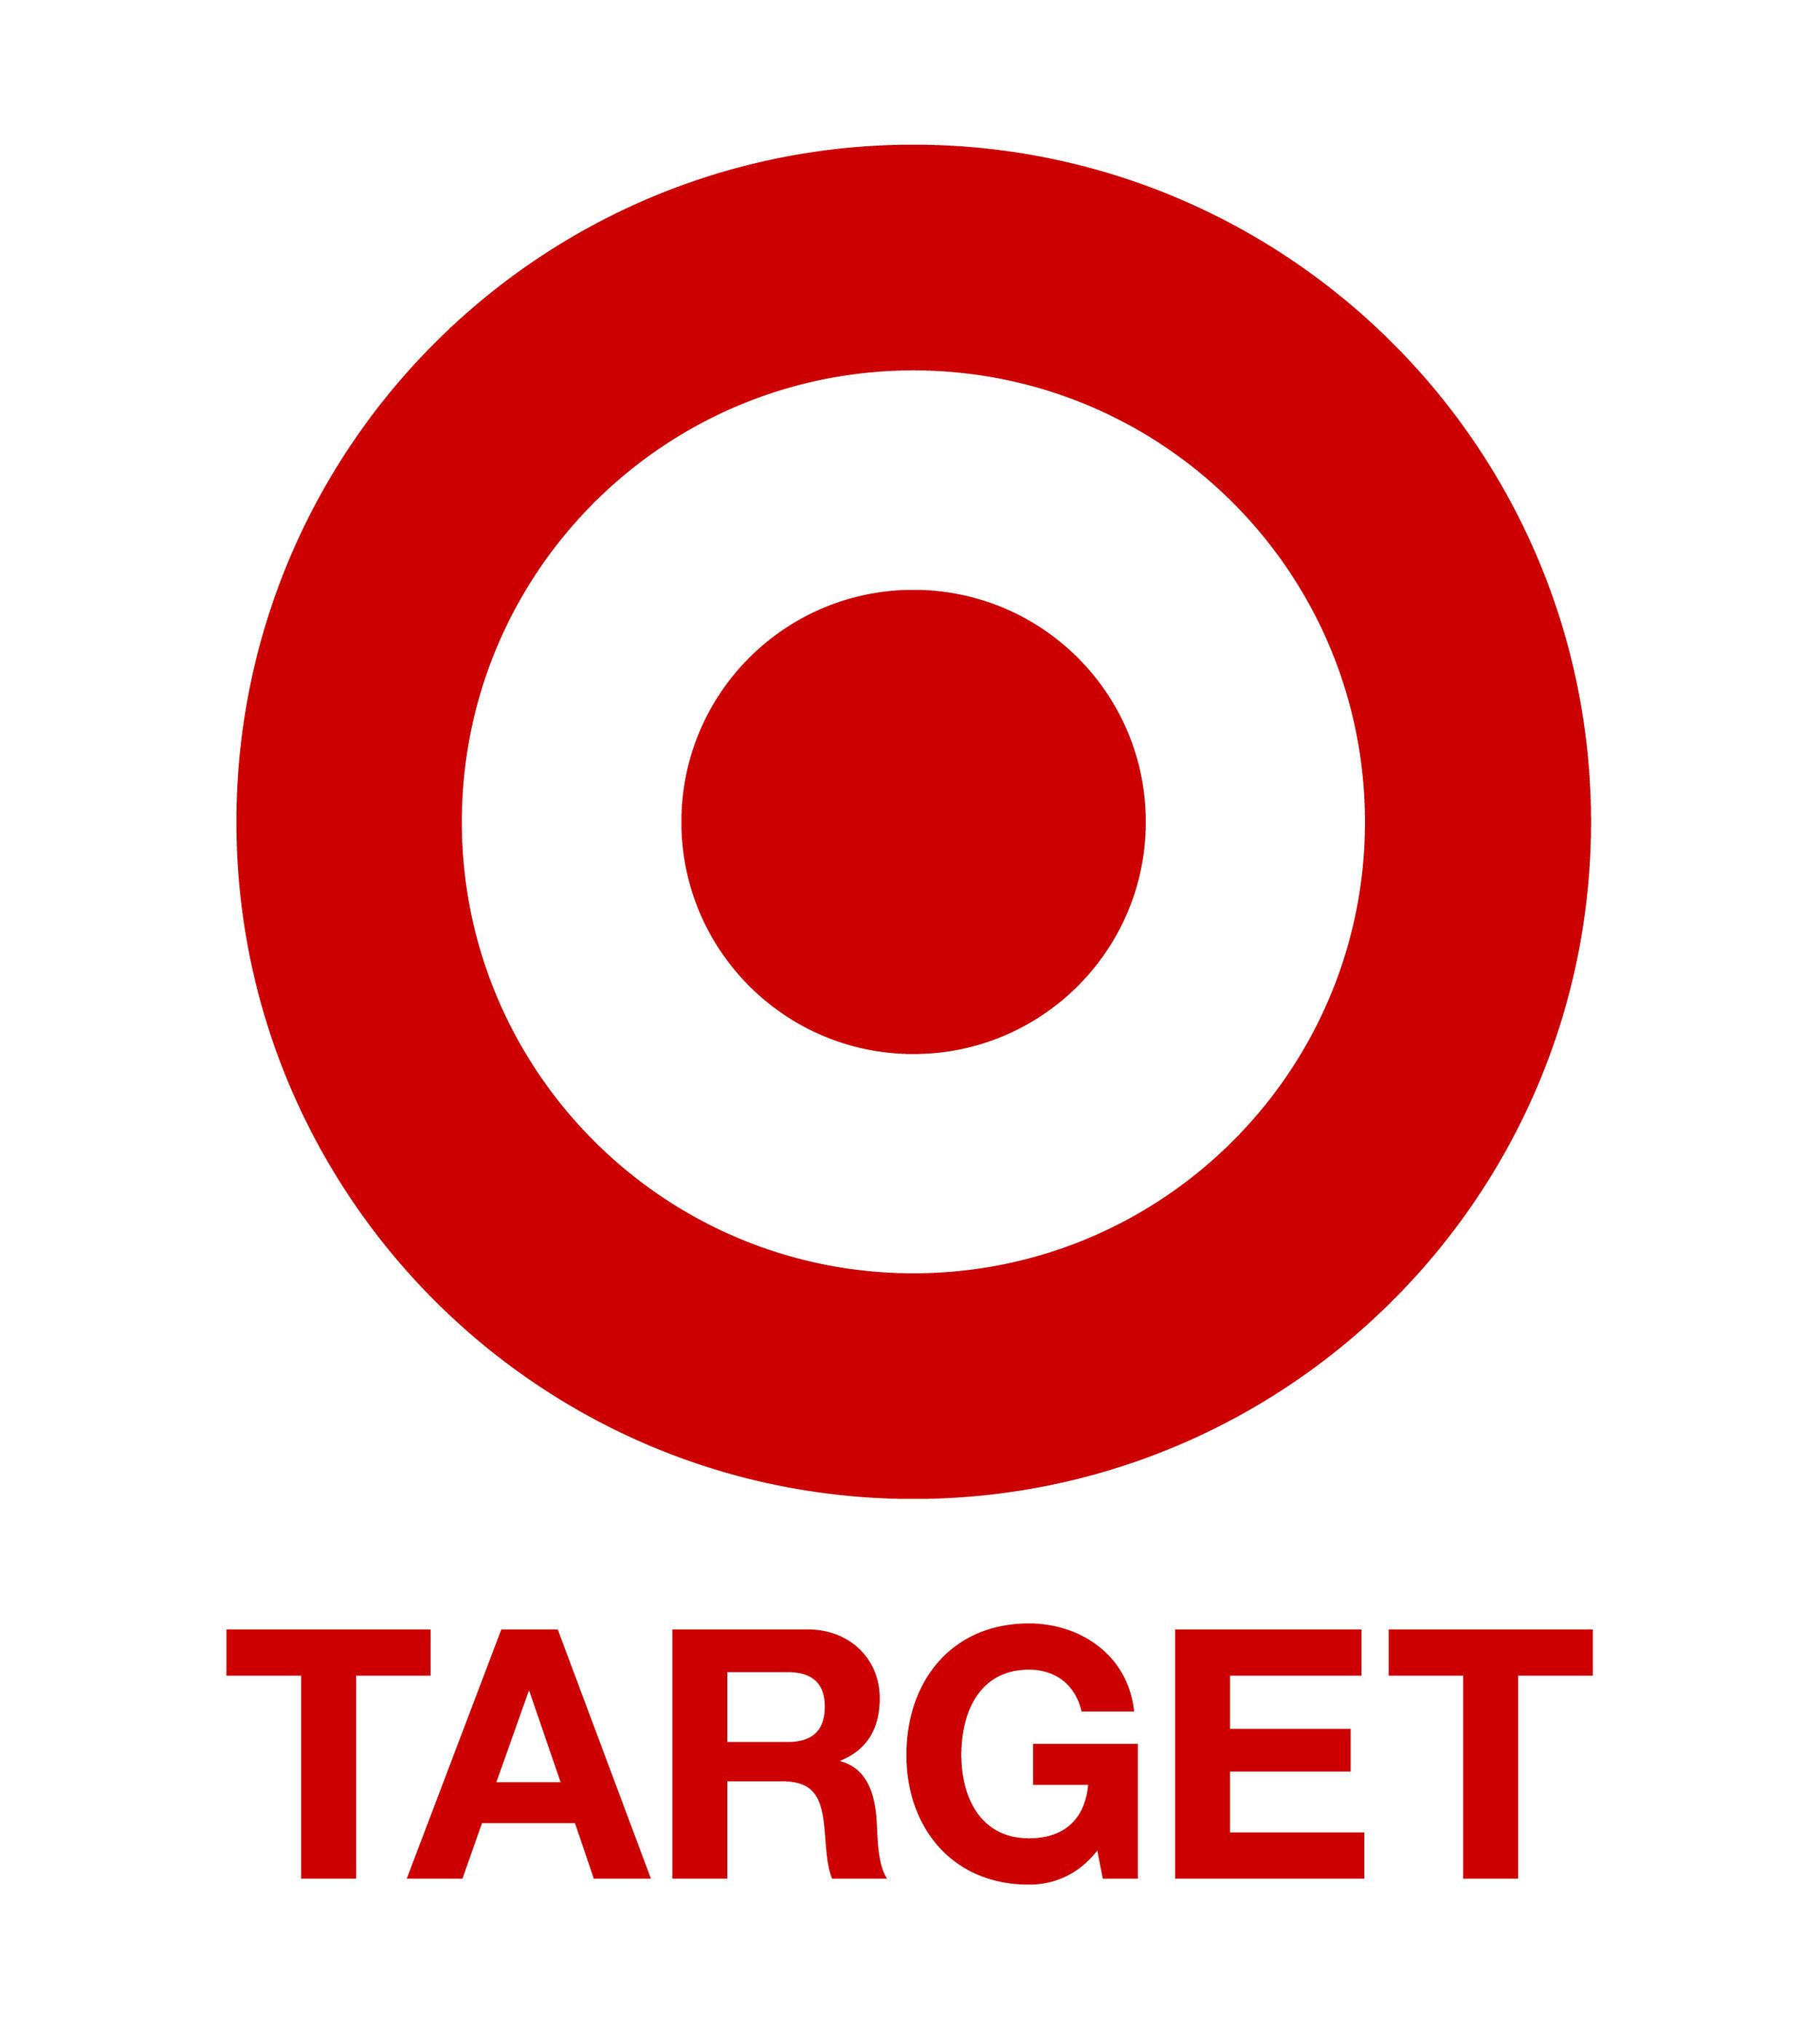 targetlogo_J.jpg